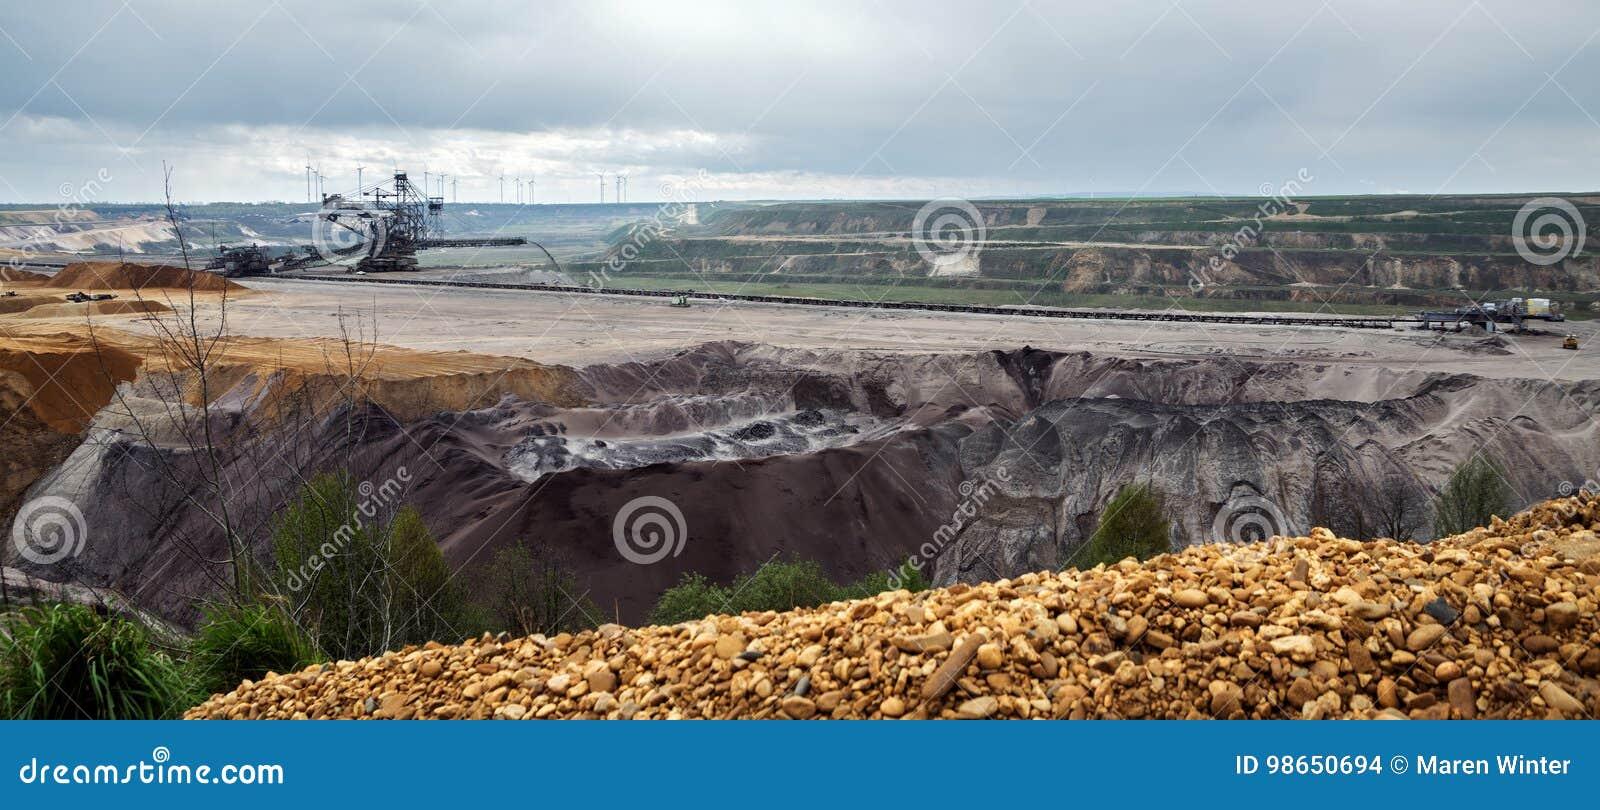 destroyed landscape in garzweiler opencast mining lignite surfa